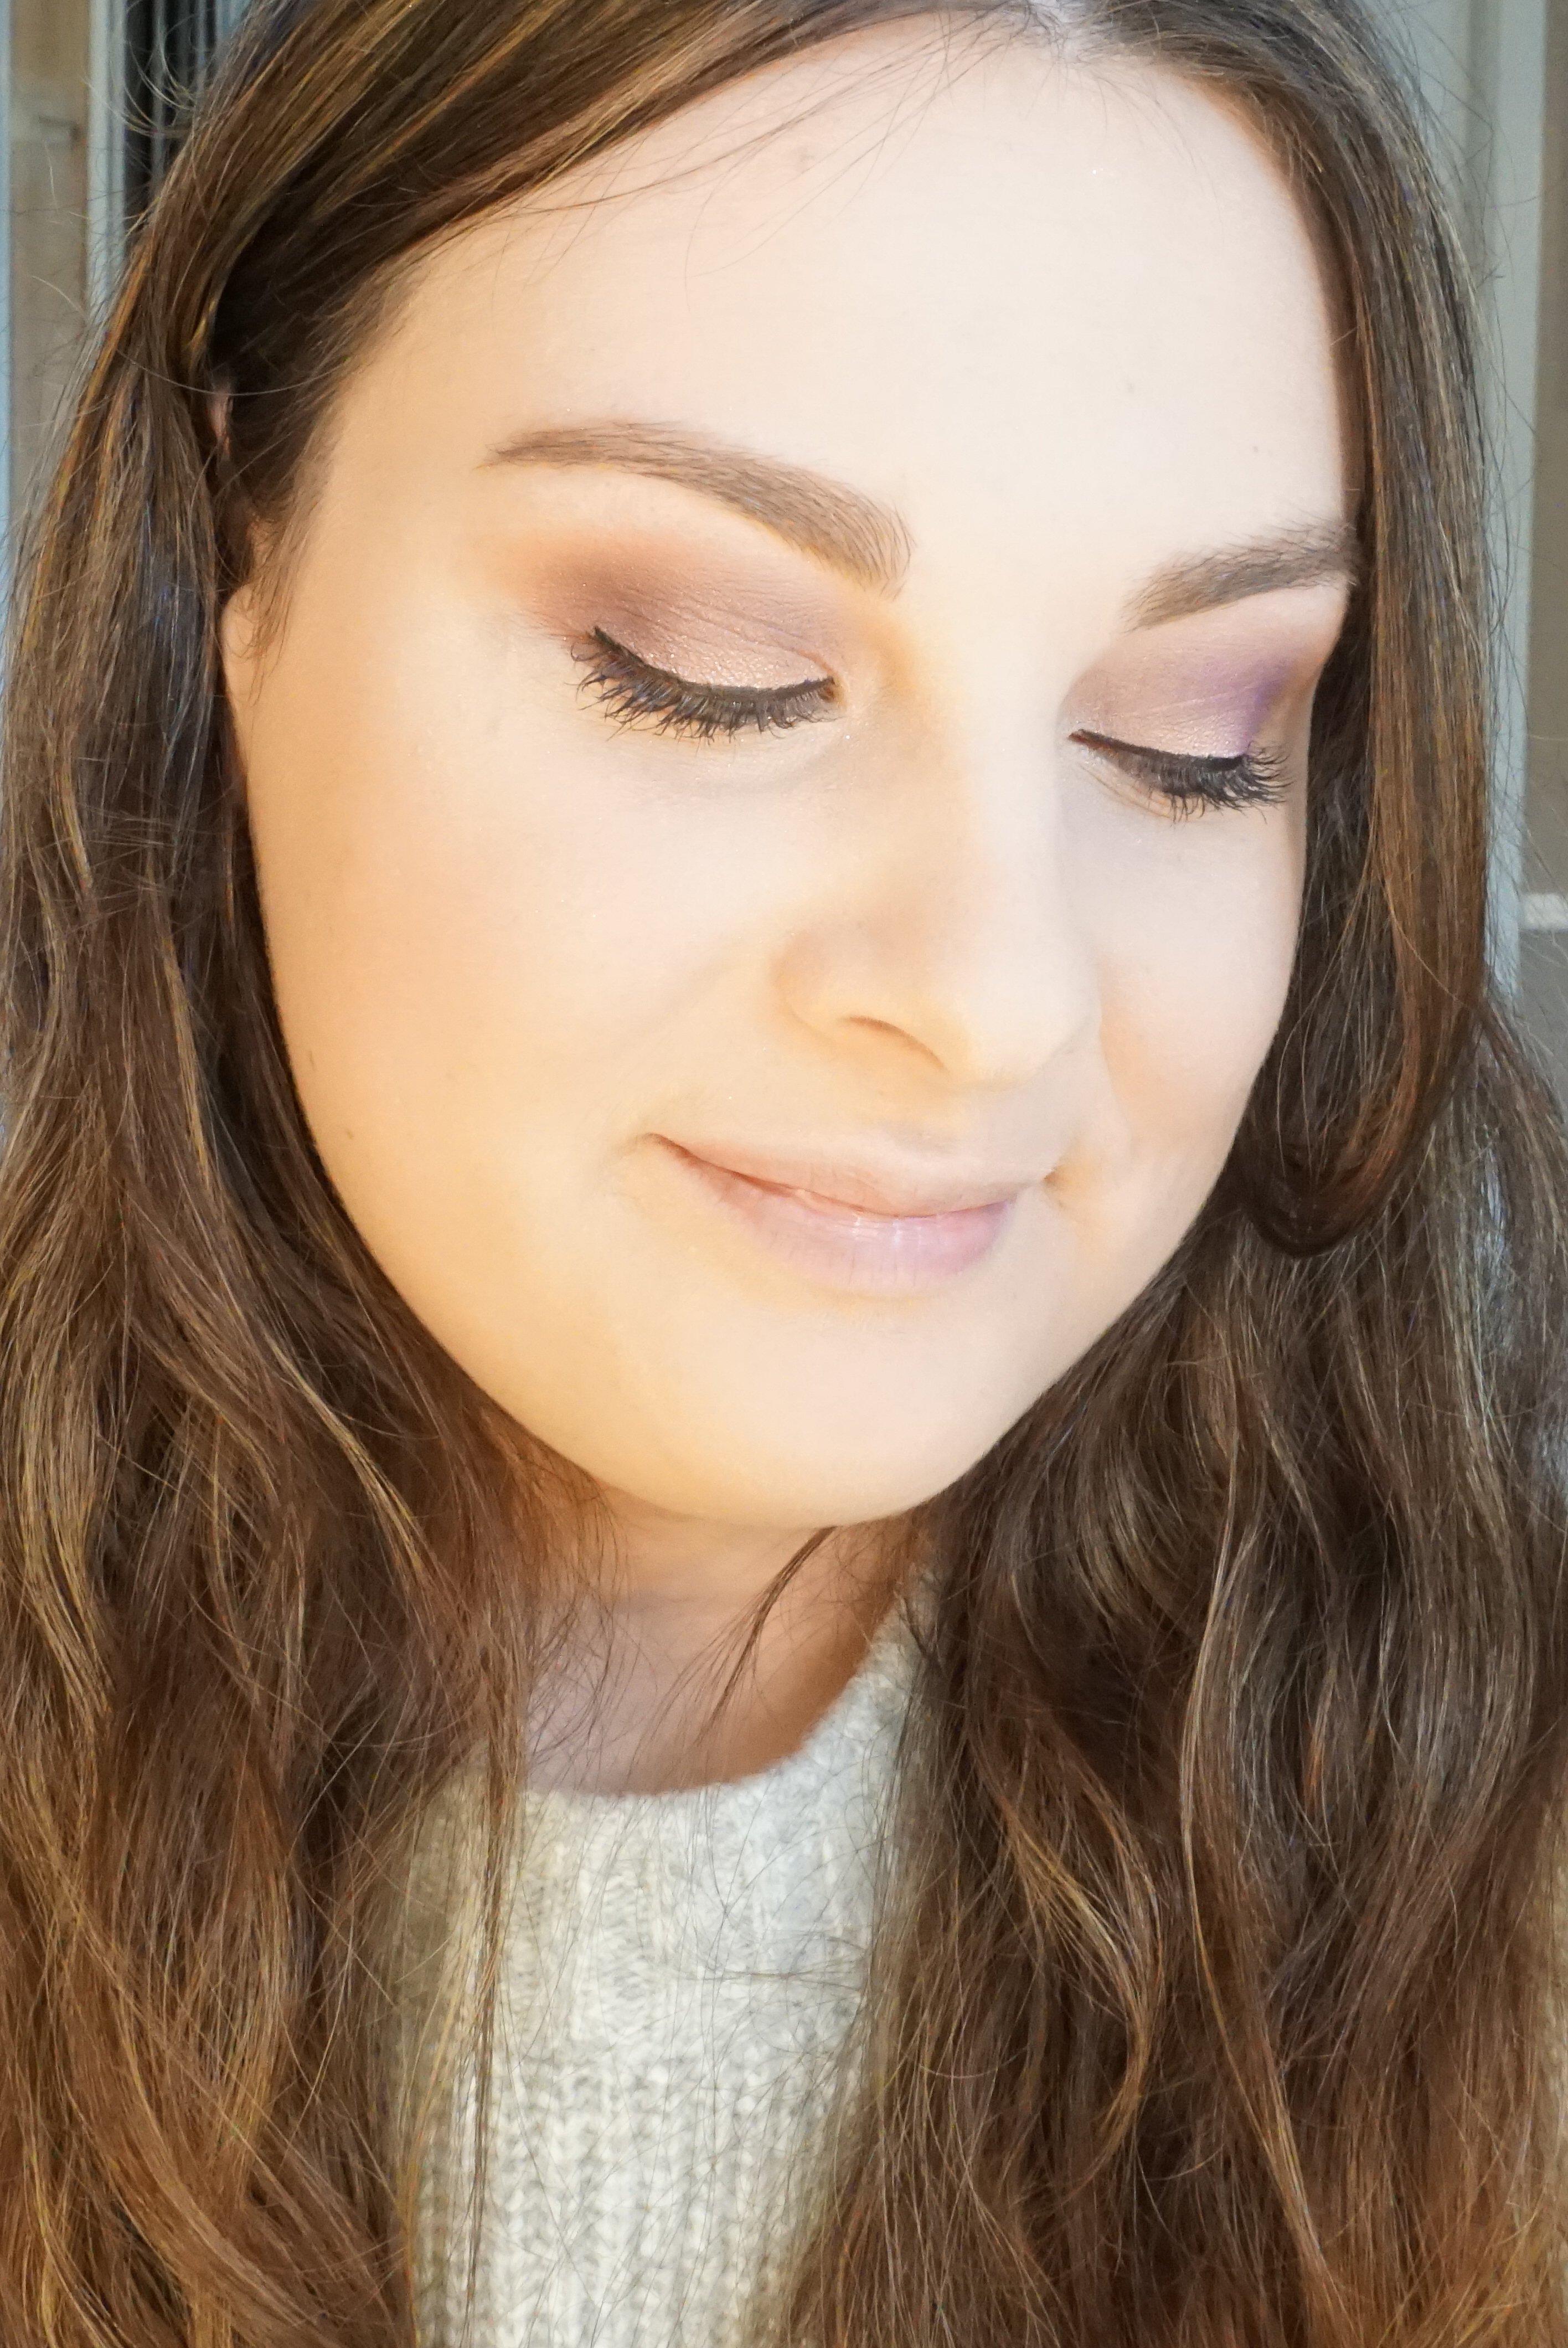 Anastasia Beverly Hills x Carli Bybel Palette Makeup Look